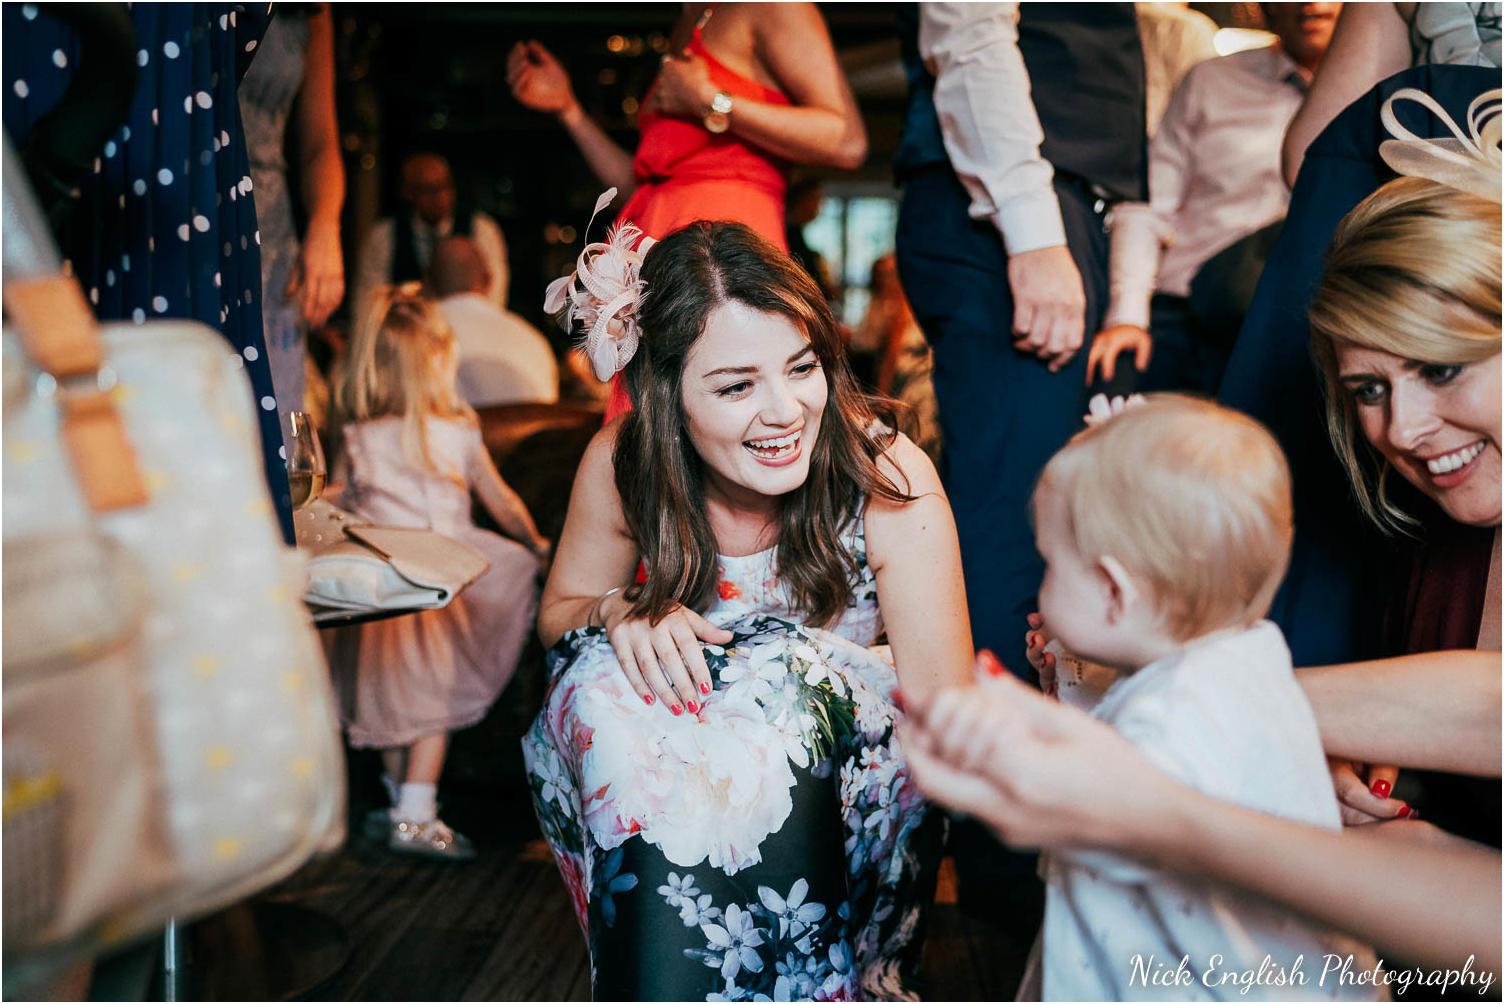 Mitton_Hall_Wedding_Summer_Photograph-125.jpg